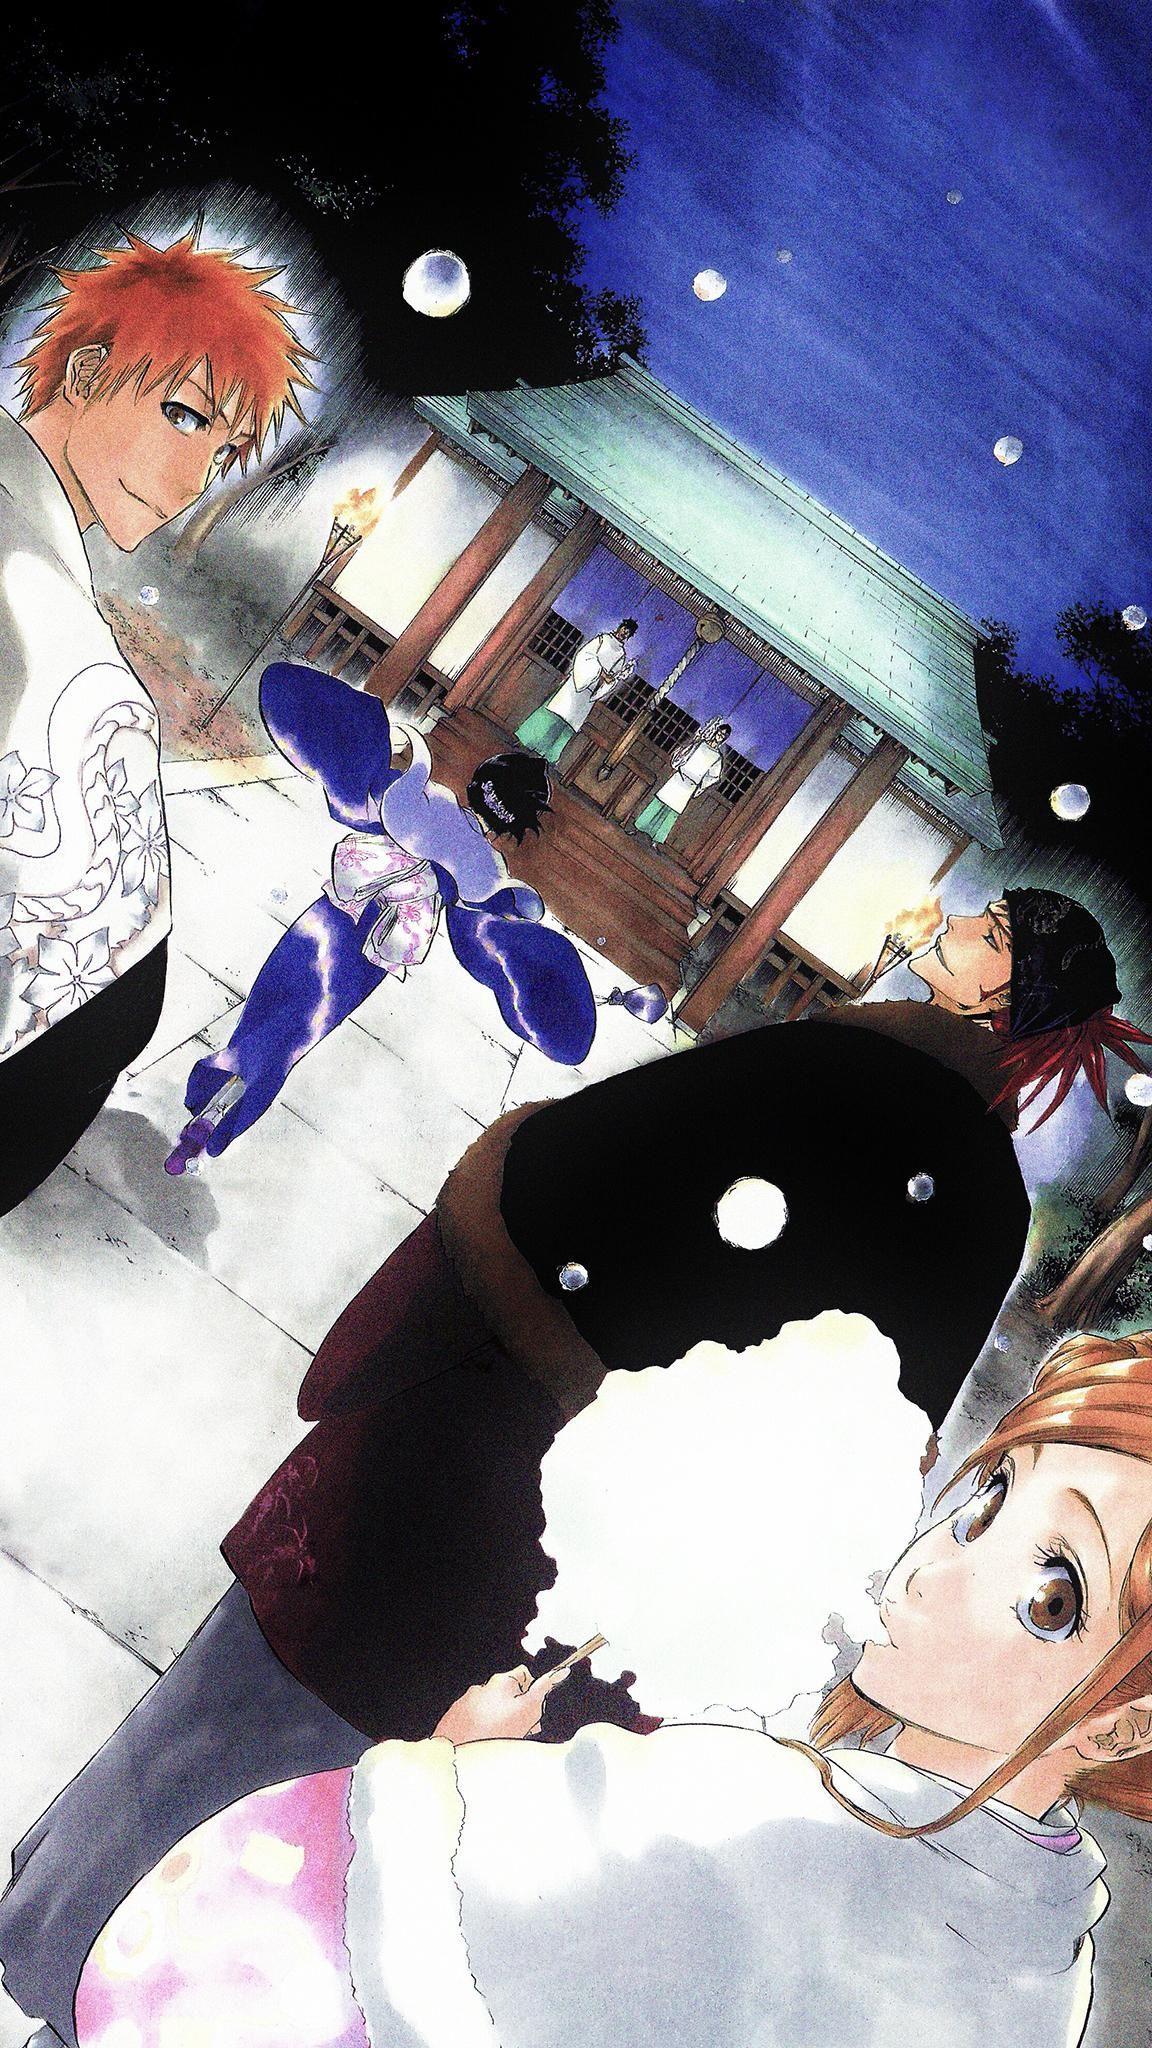 Bleach Tybw Wallpaper In 2020 Bleach Anime Bleach Fanart